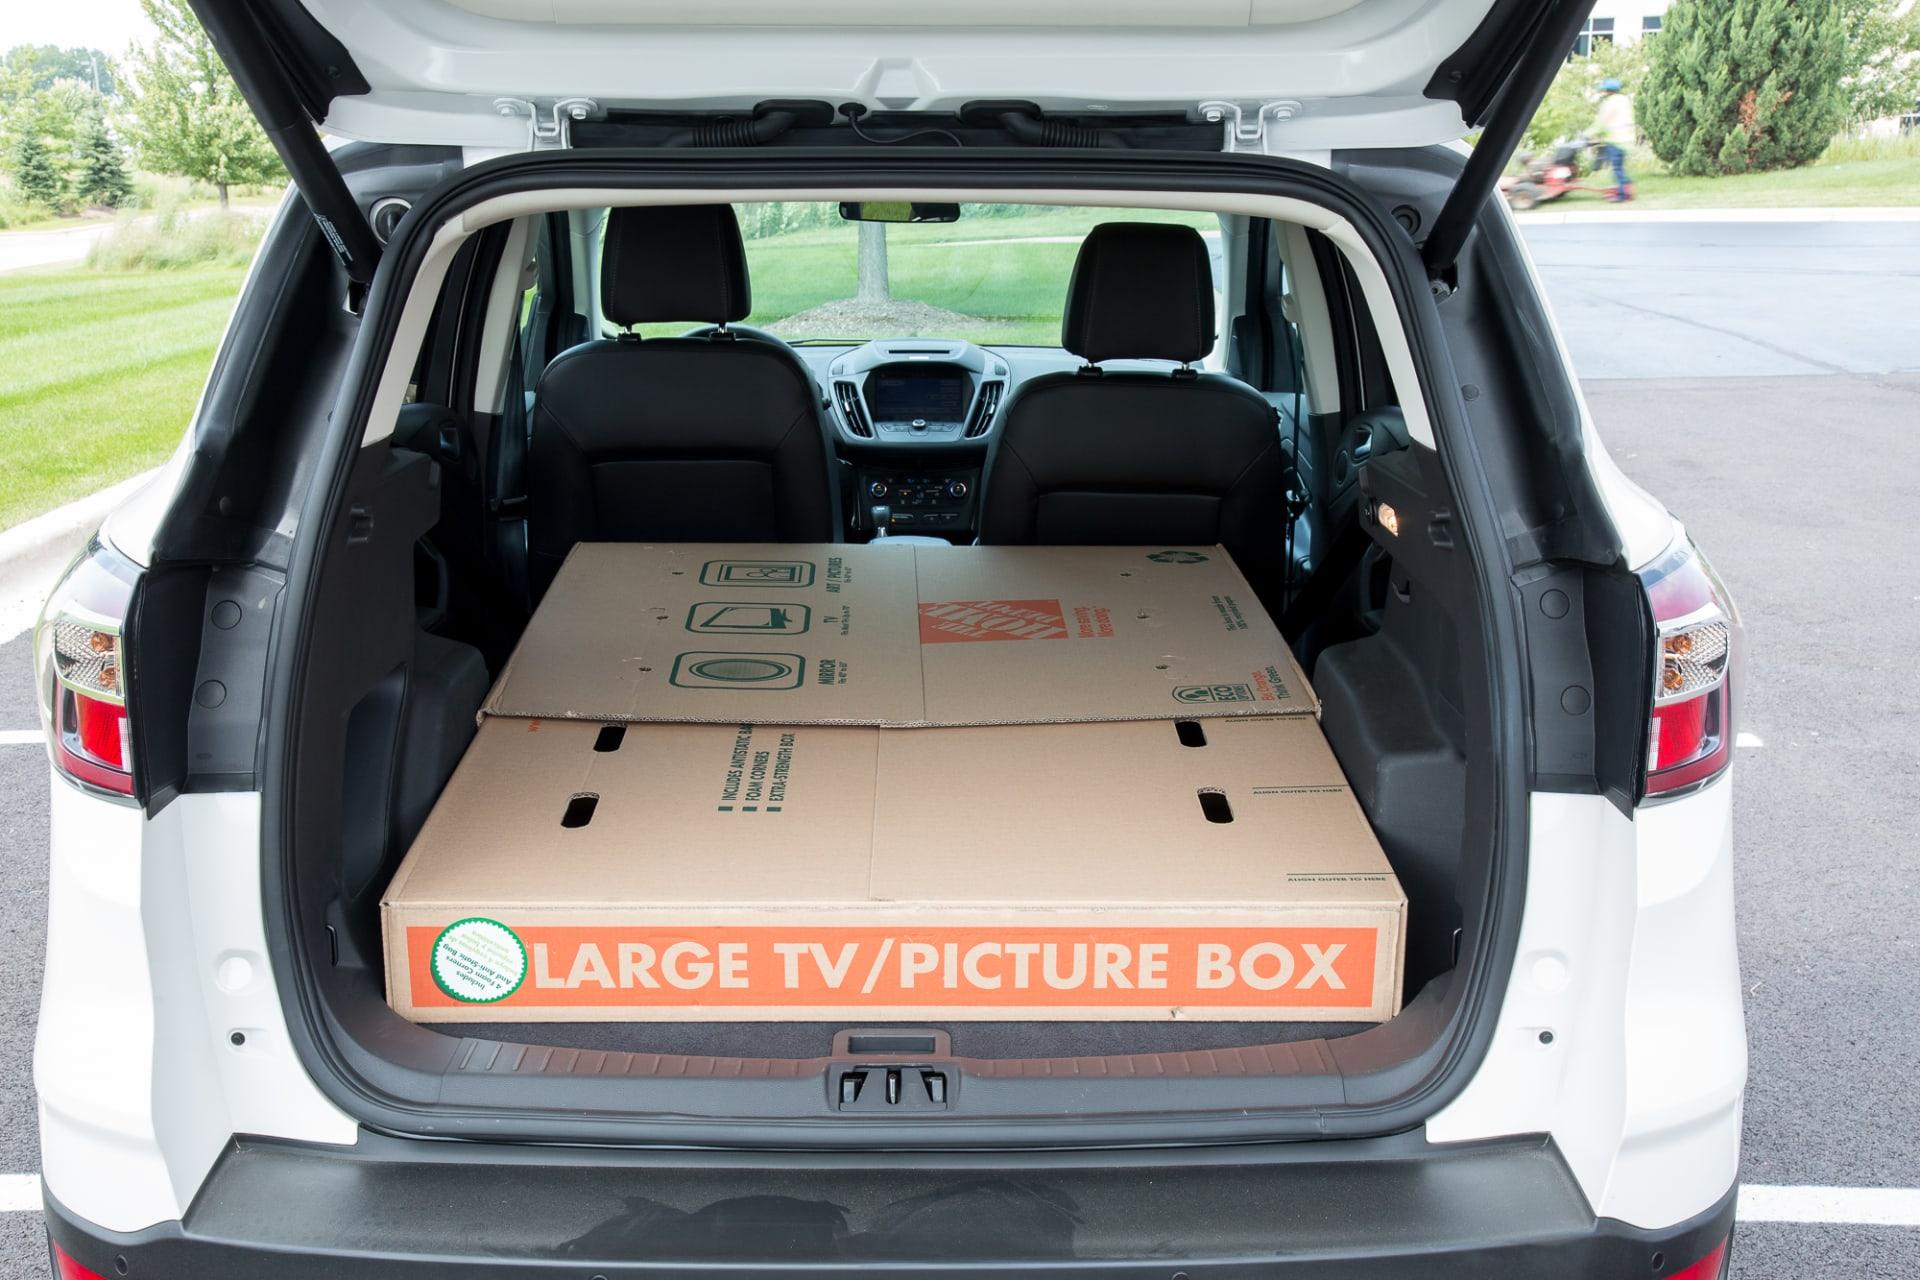 2017 Ford Escape Real World Cargo Space News Cars Com